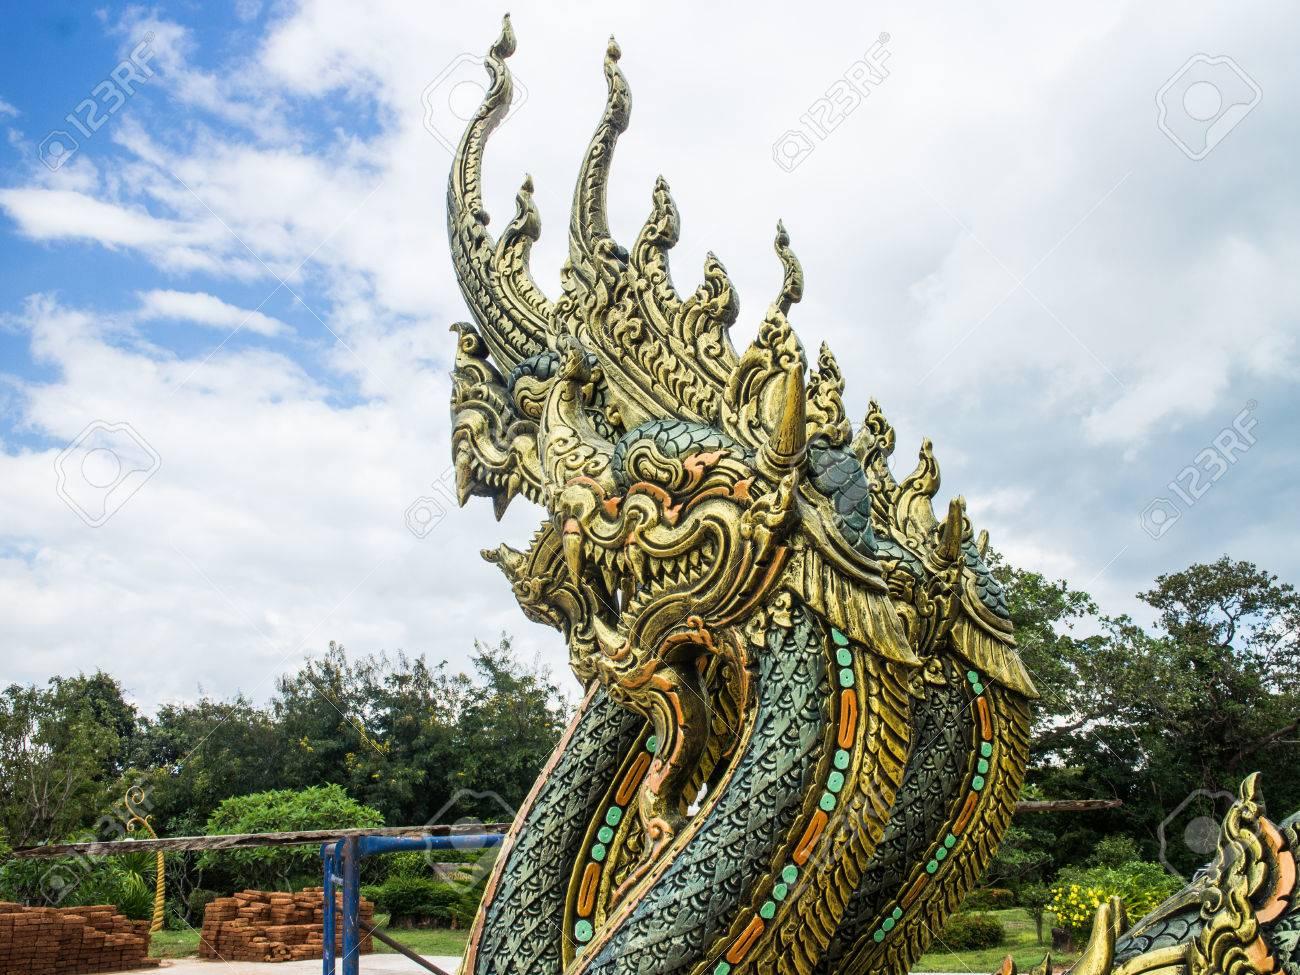 Image result for king of snake